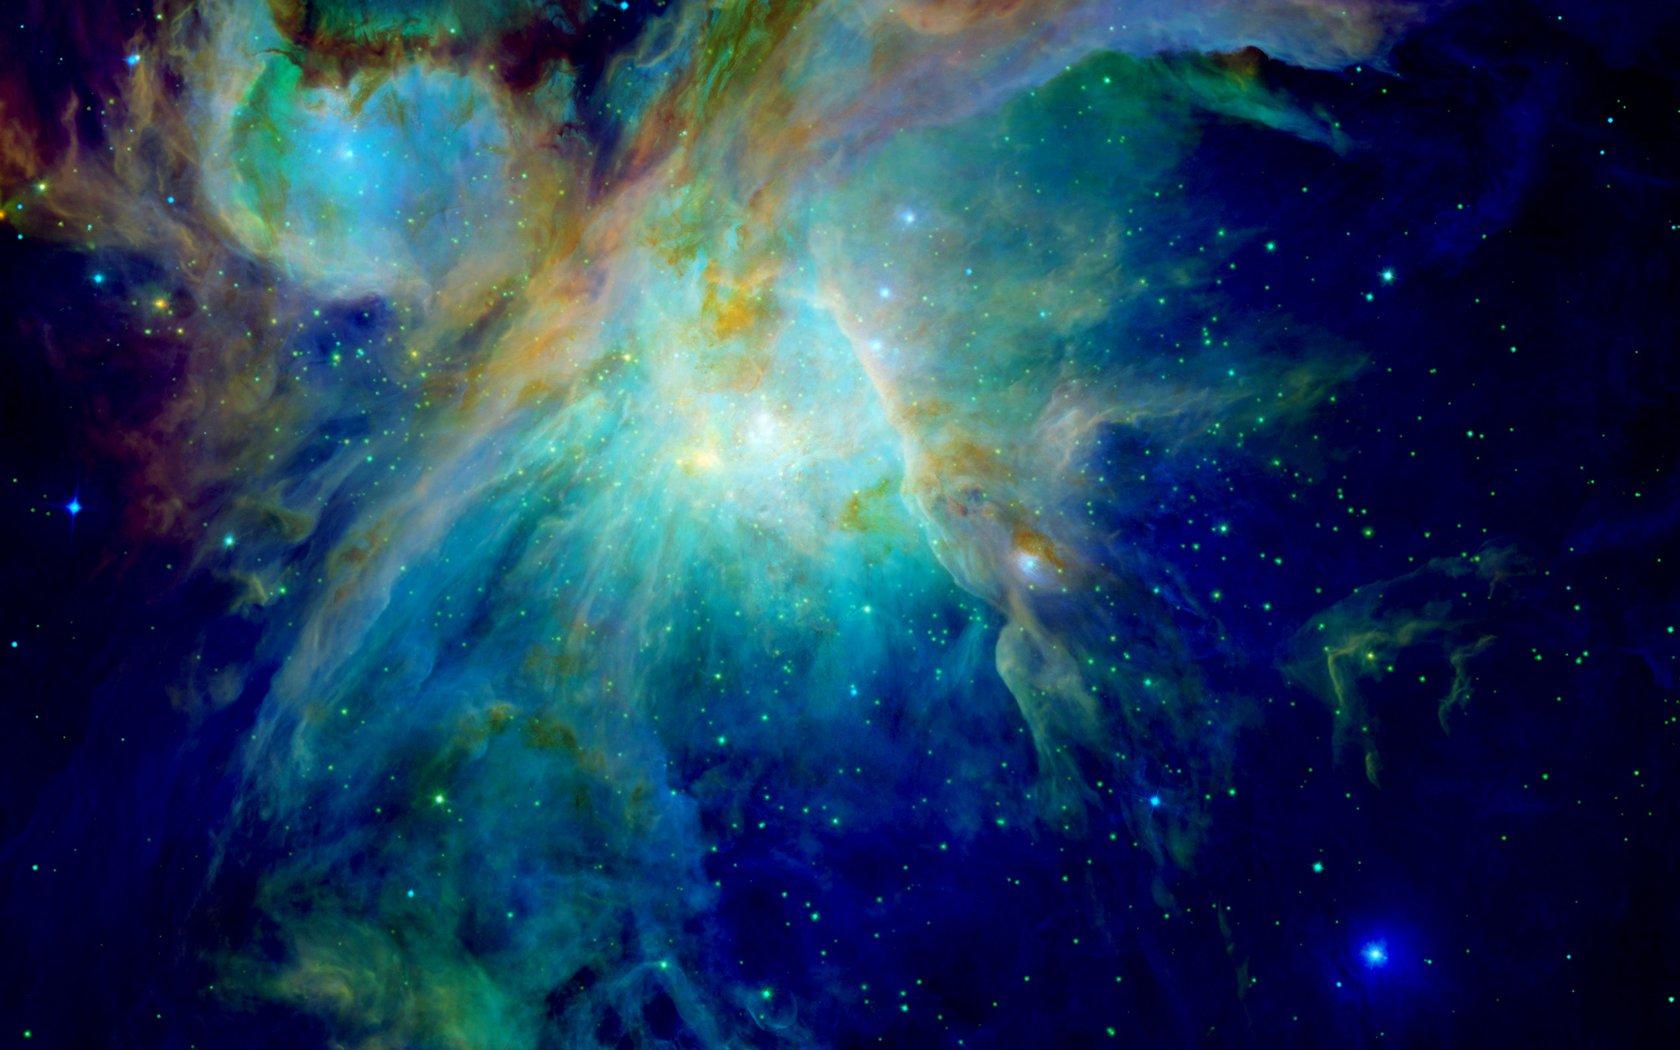 orion nebula space nebulae wallpapers stars chris wallpapersafari faith code